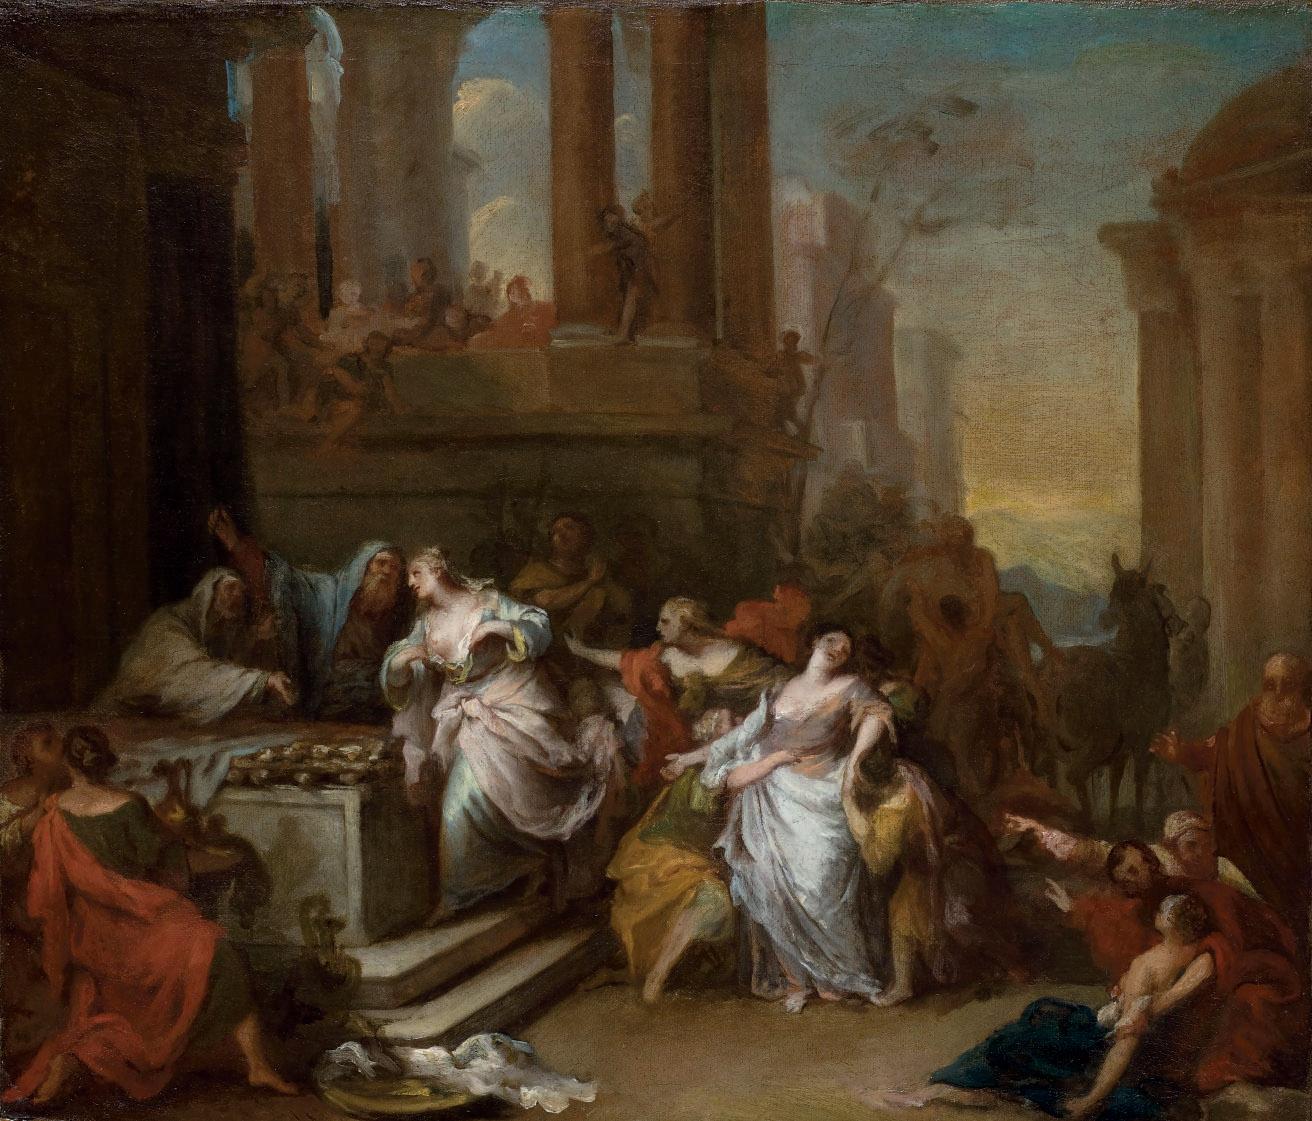 Esquisse d'une scène antique